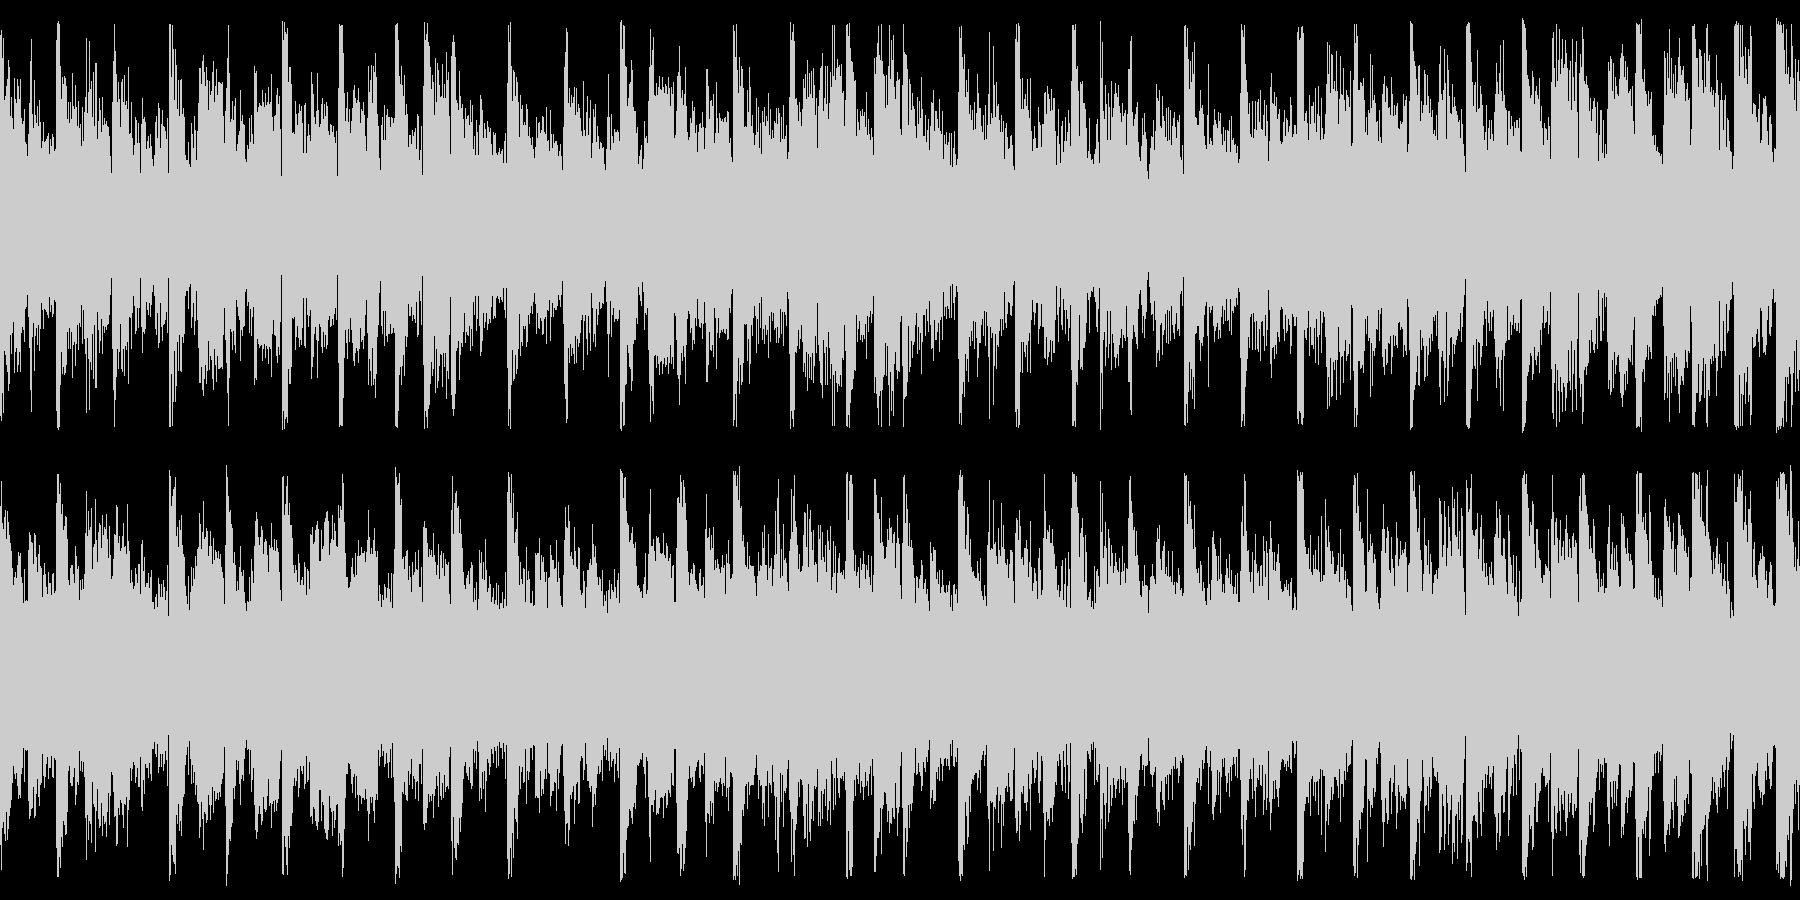 TikTok Dance 可愛い ループの未再生の波形